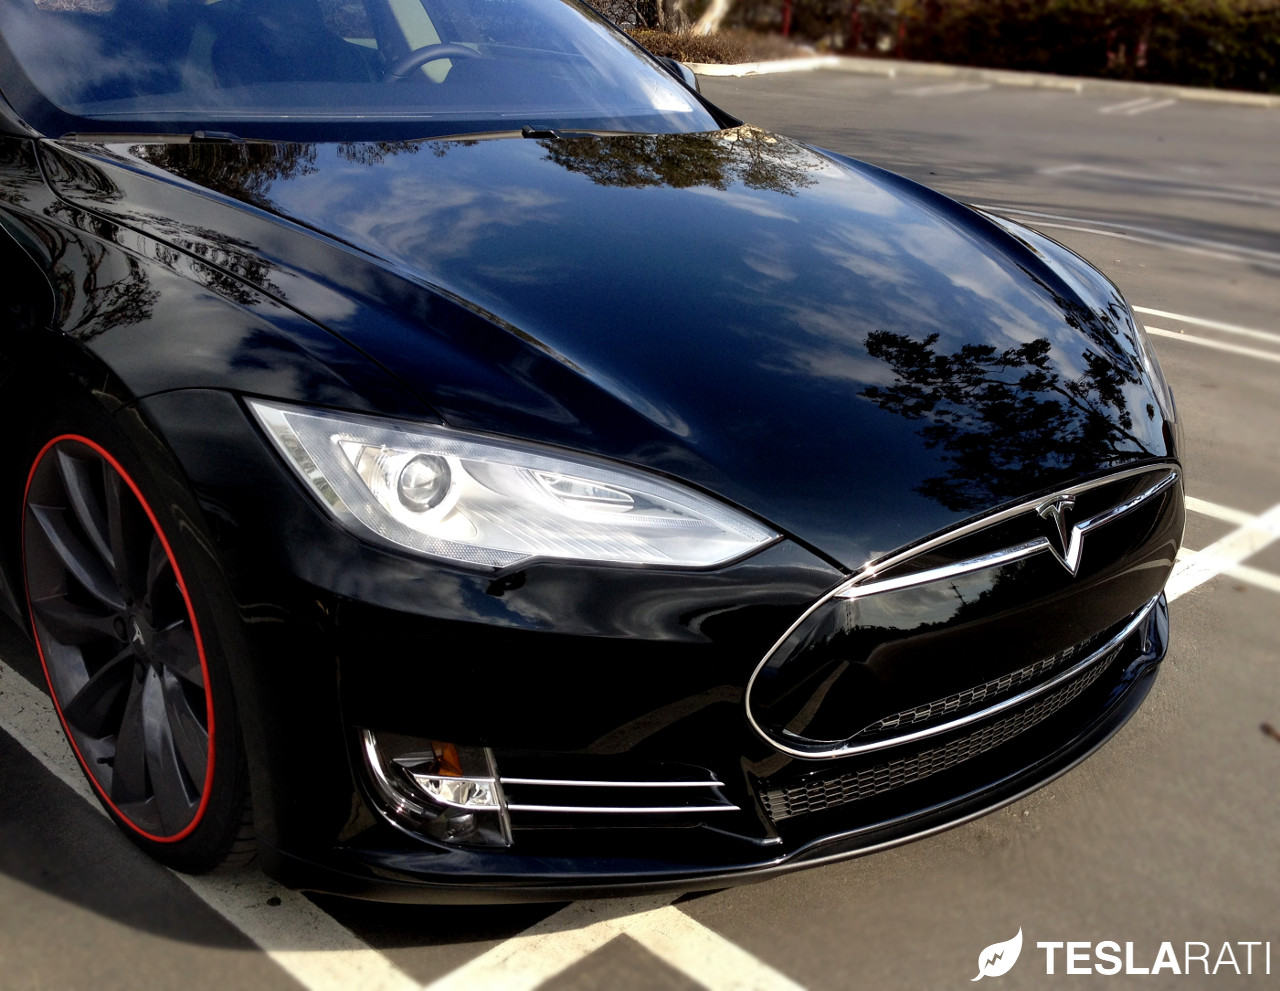 Teslarati-Model-S-Wings-No-Plate-Nose-Cone